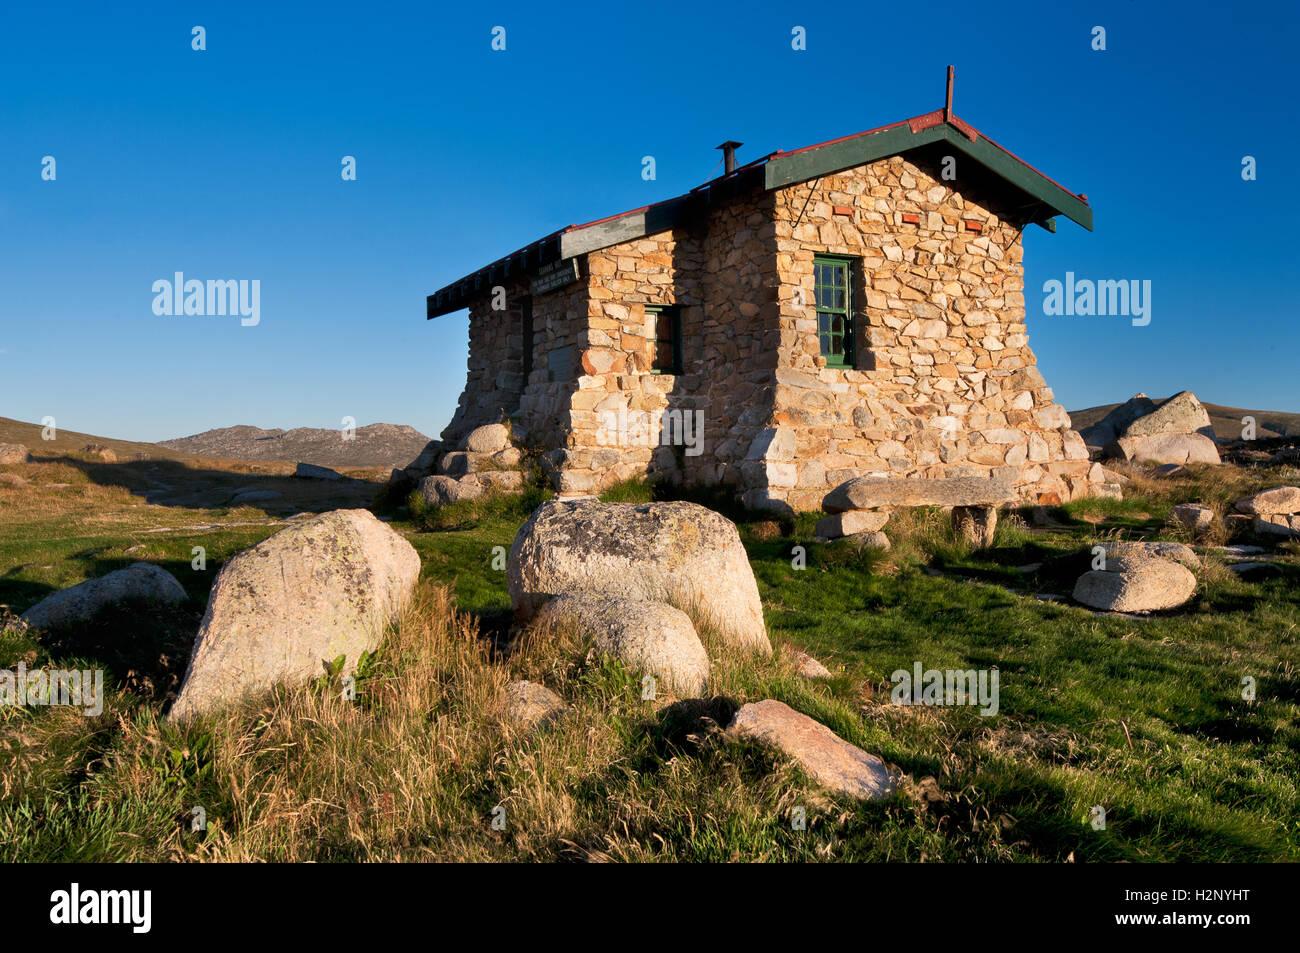 Seaman's Hut in Kosciuszko national Park. - Stock Image